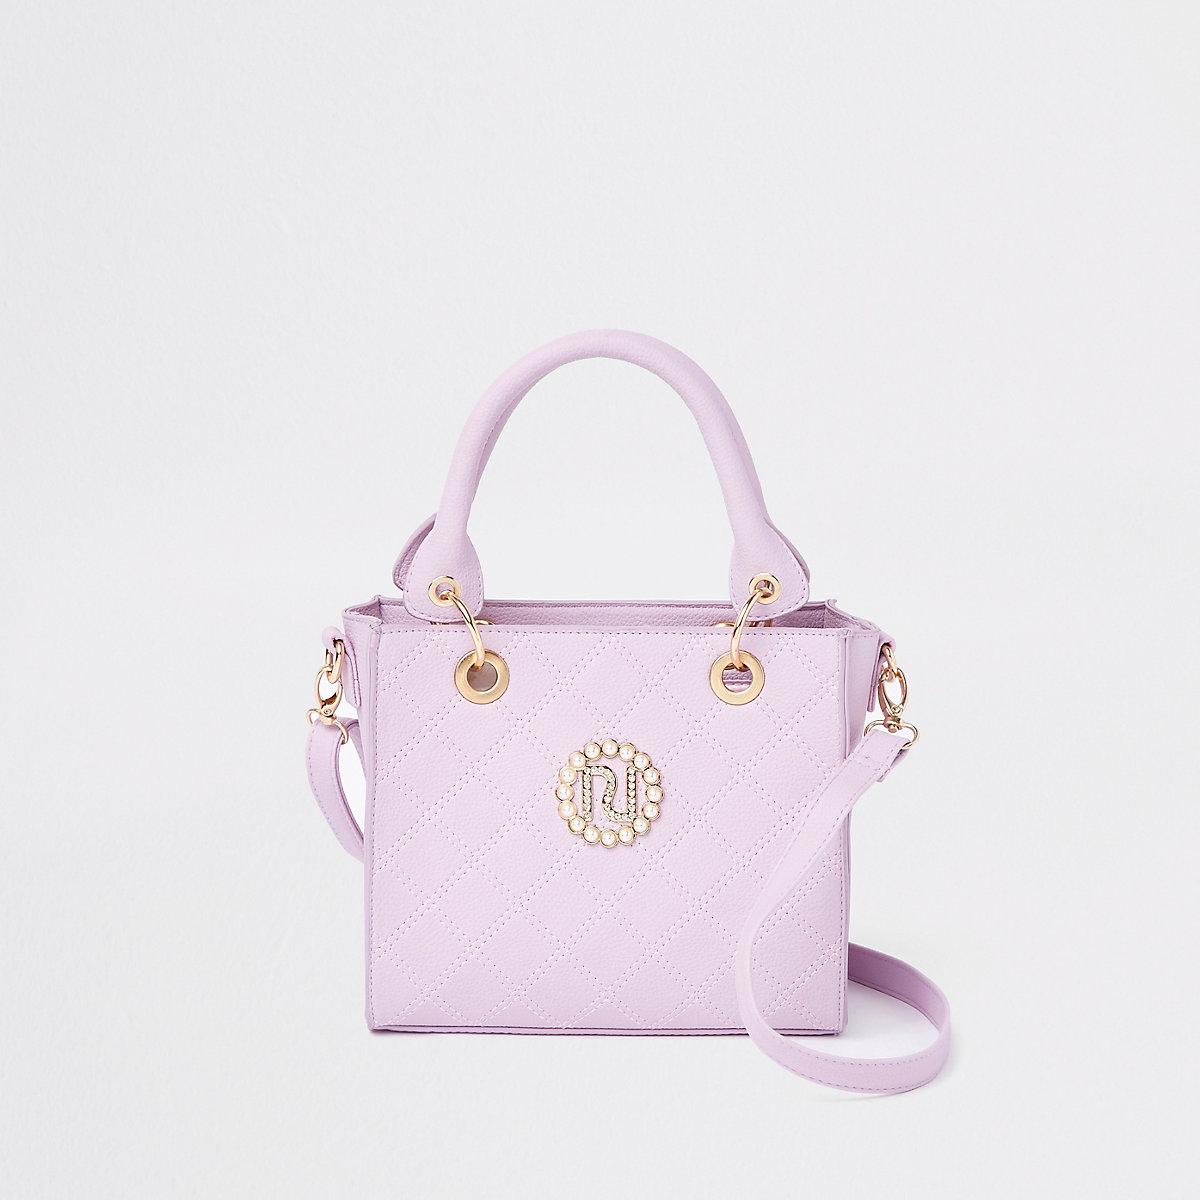 Girls purple boxy tote bag